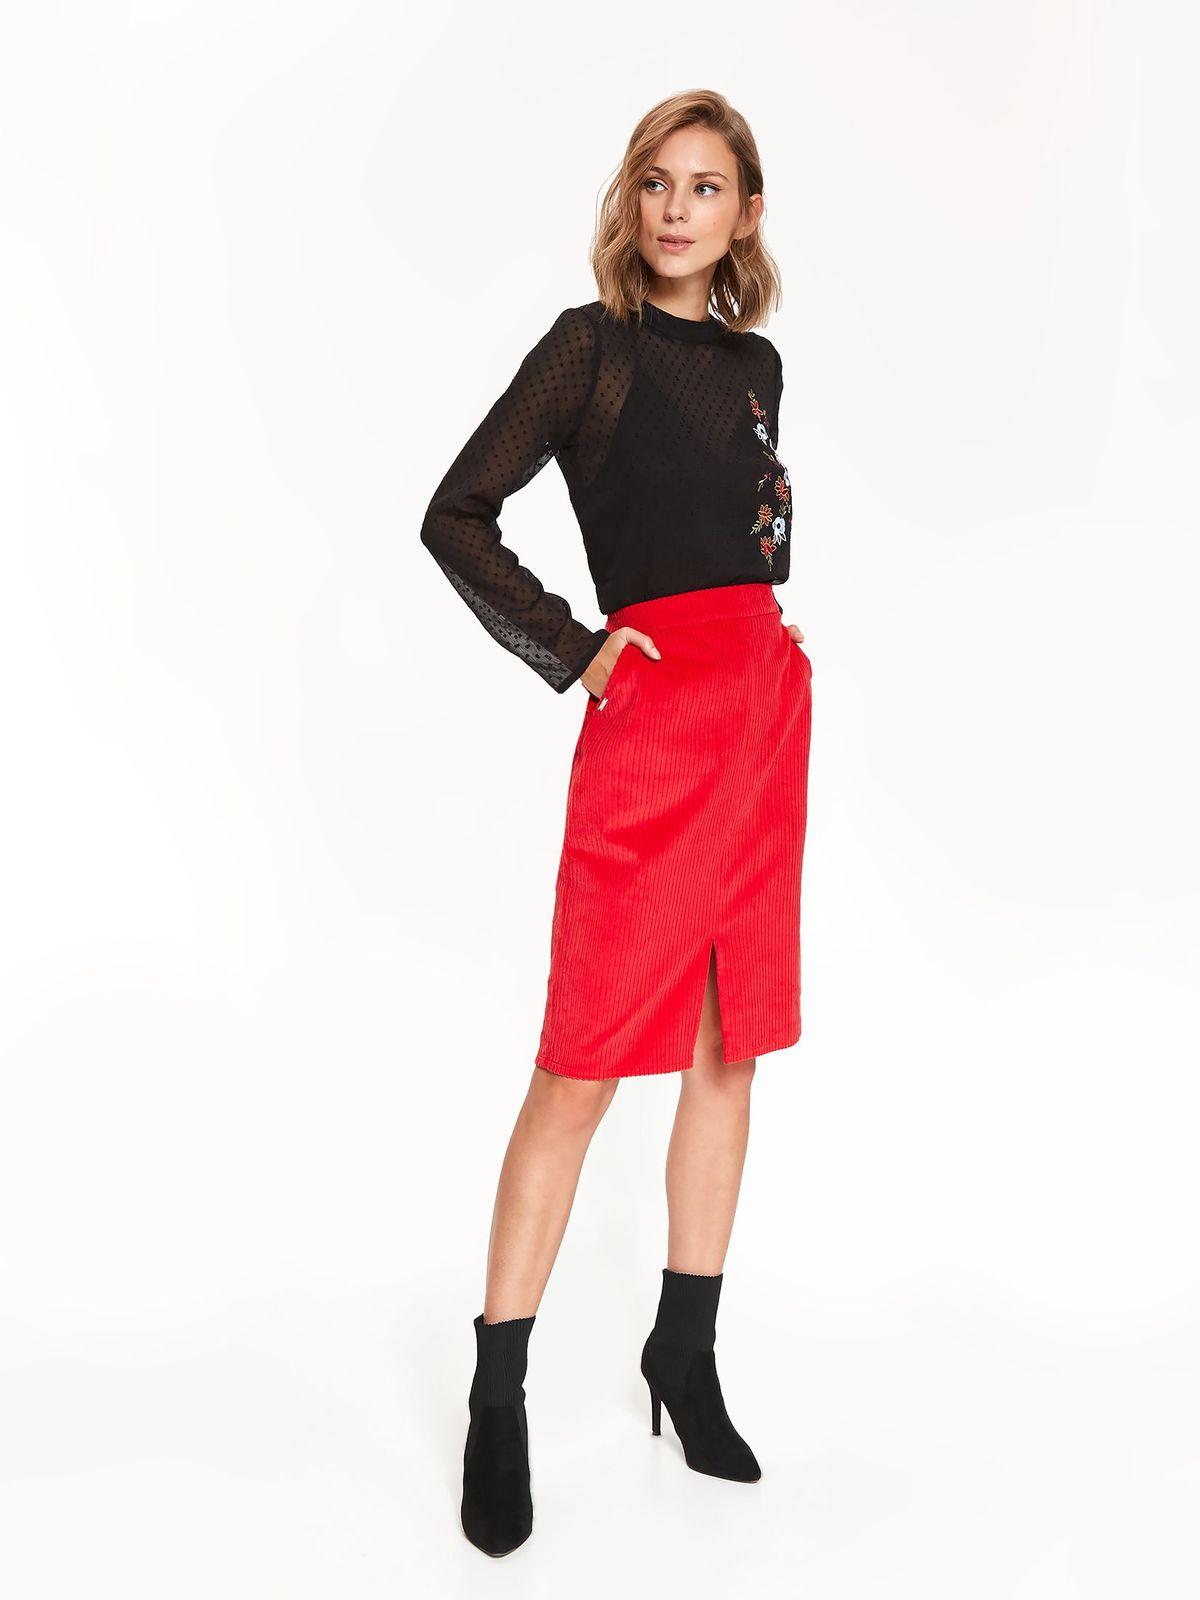 9544c8f754 top-secret-red-midi-high-waisted-pencil-skirt-S042419-1-411152.jpg